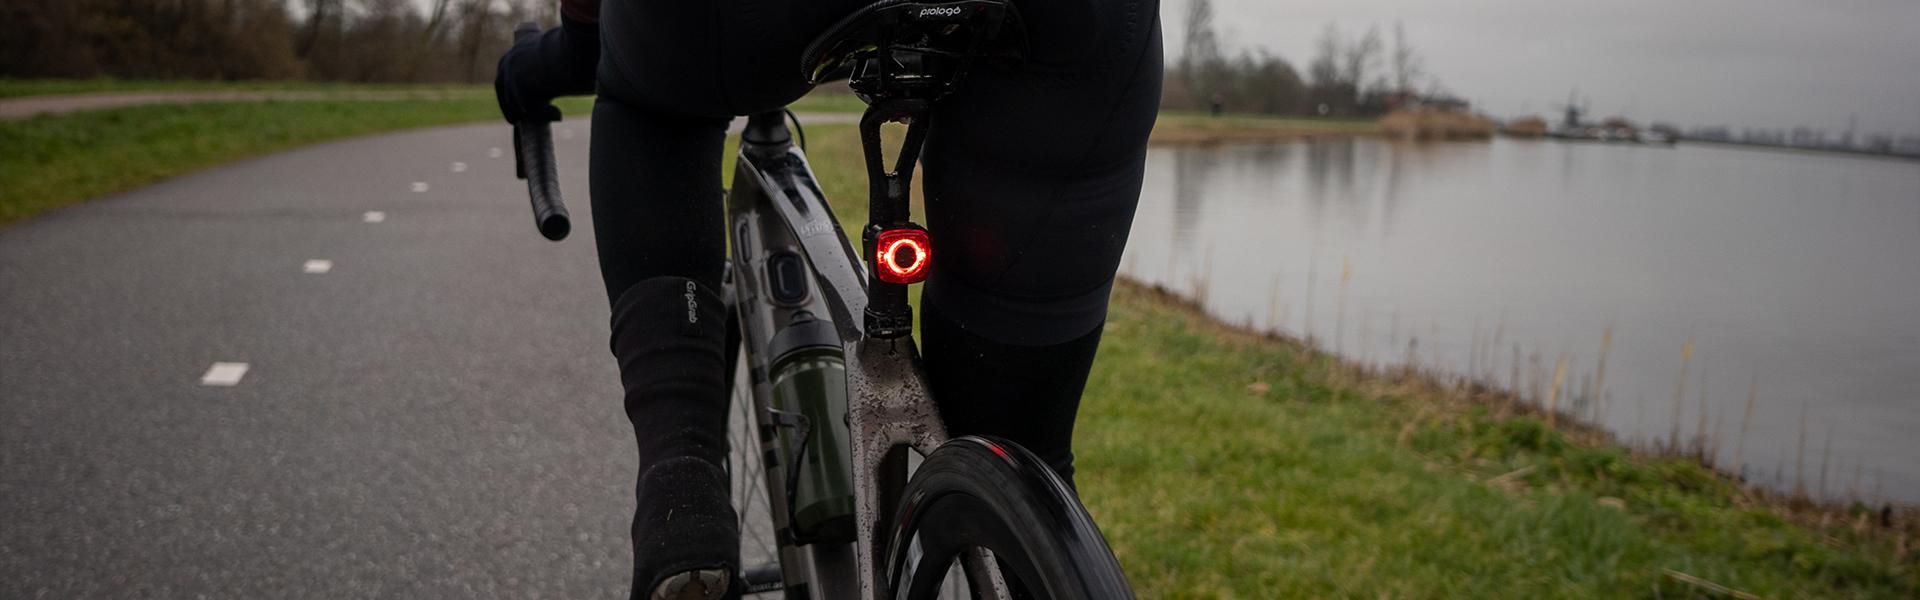 Sate-lite  bike light StVZO eletric bike rear light CREE LED waterproof